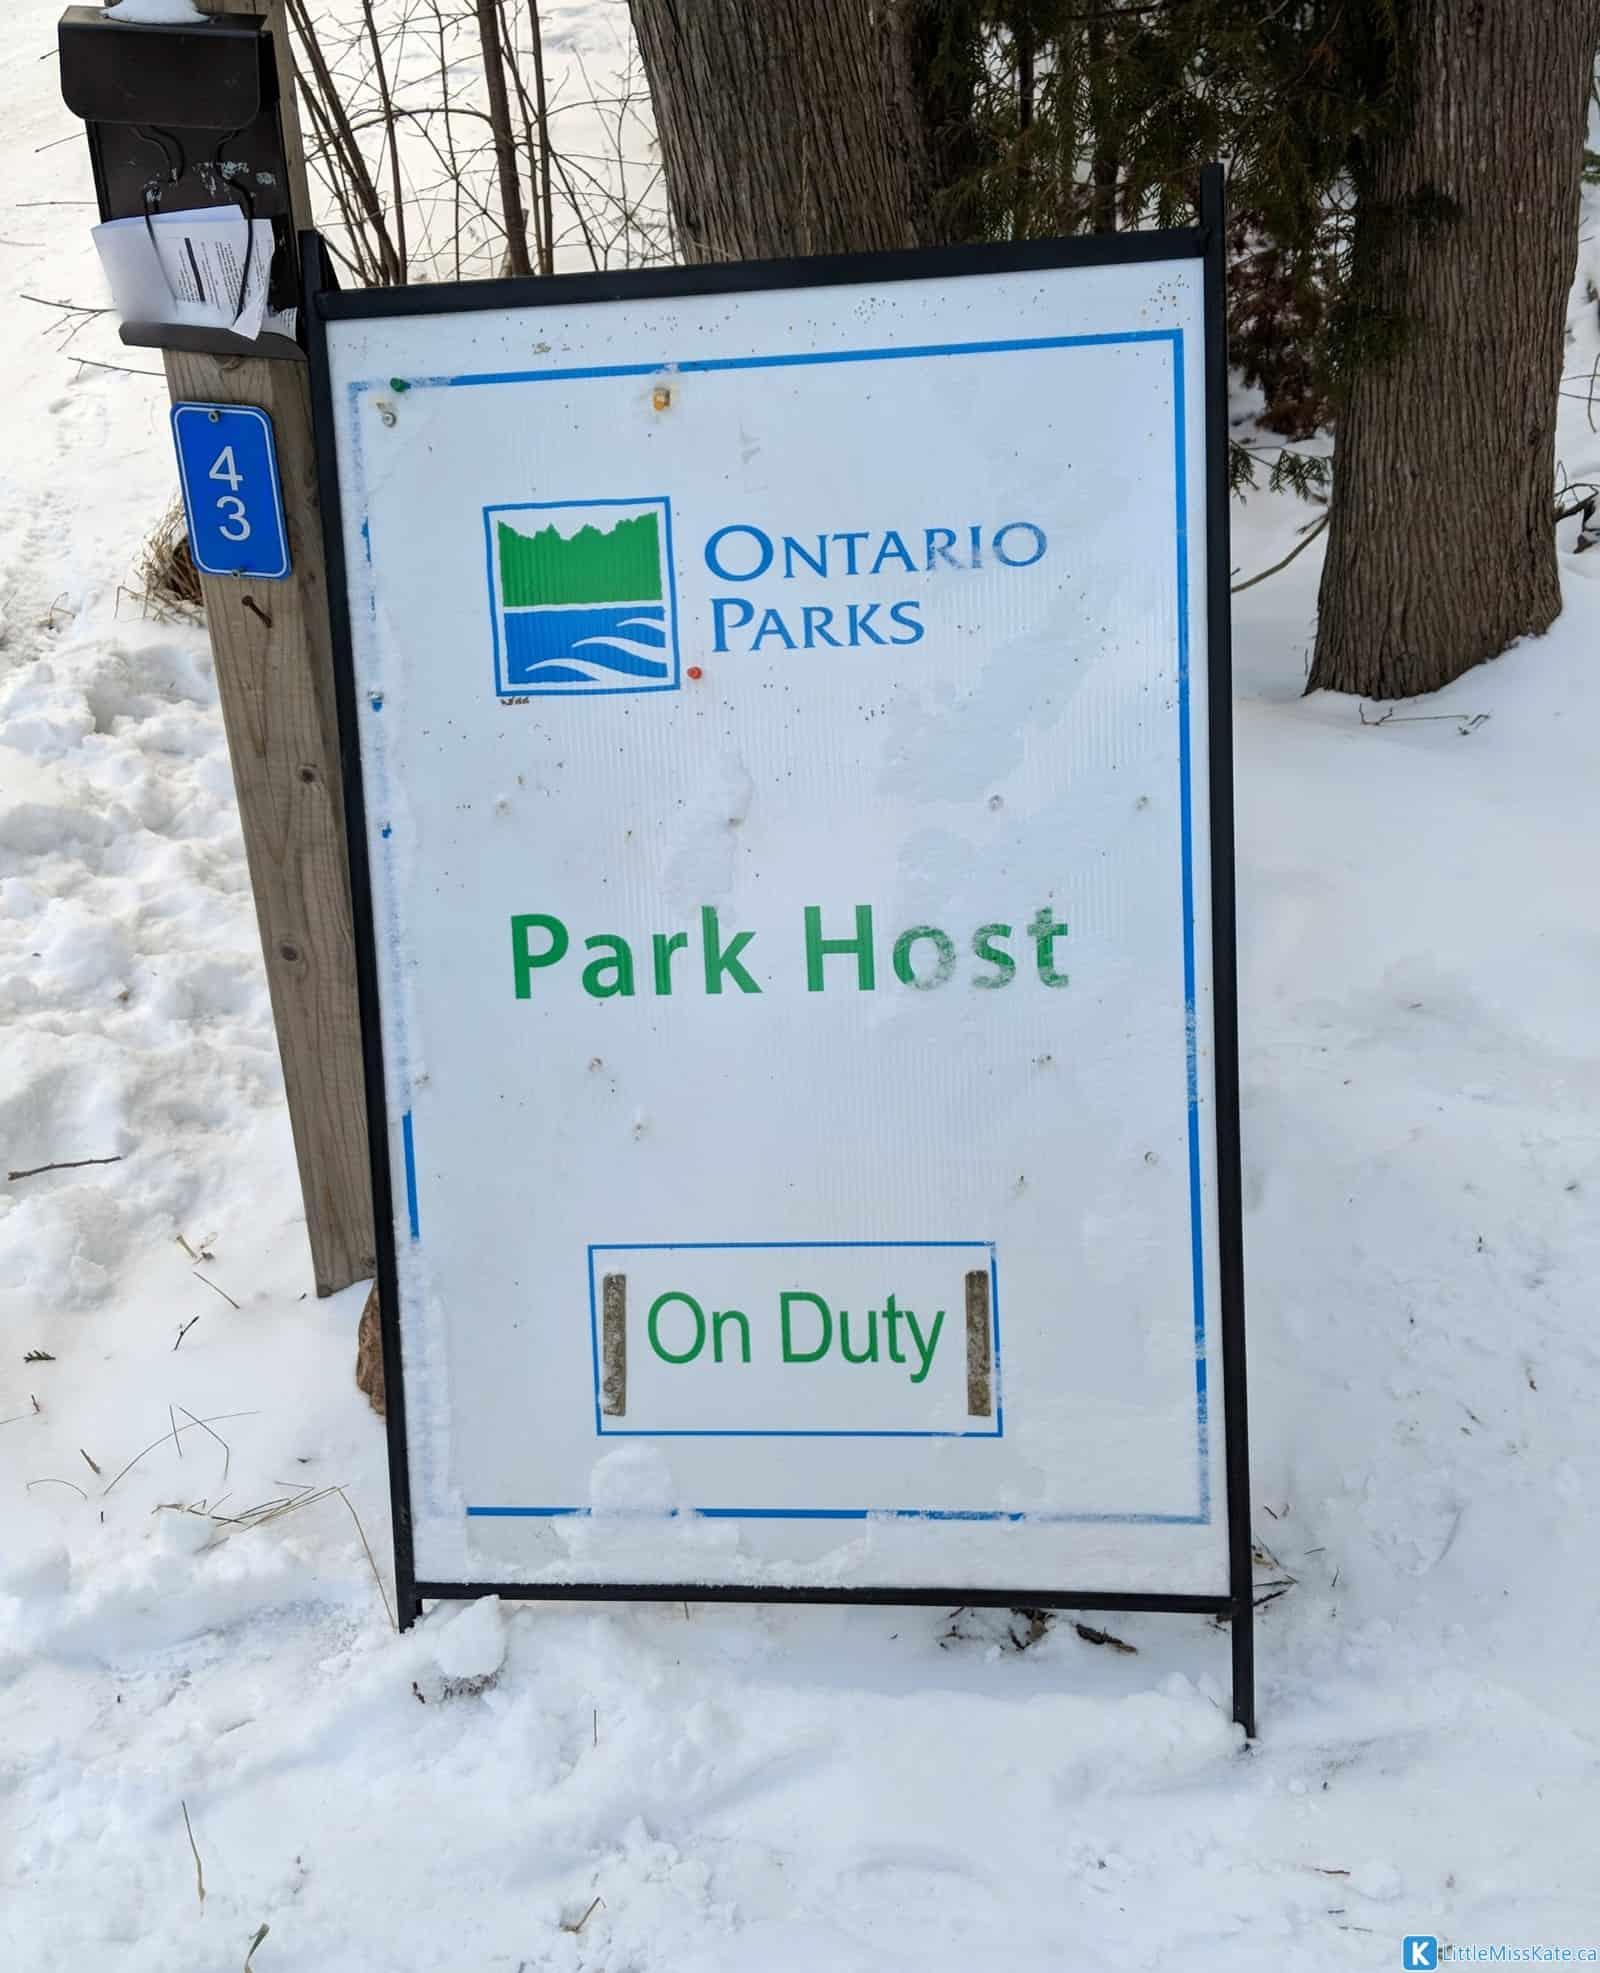 Ontario Parks Park Host MacGregor Point Provincial Park